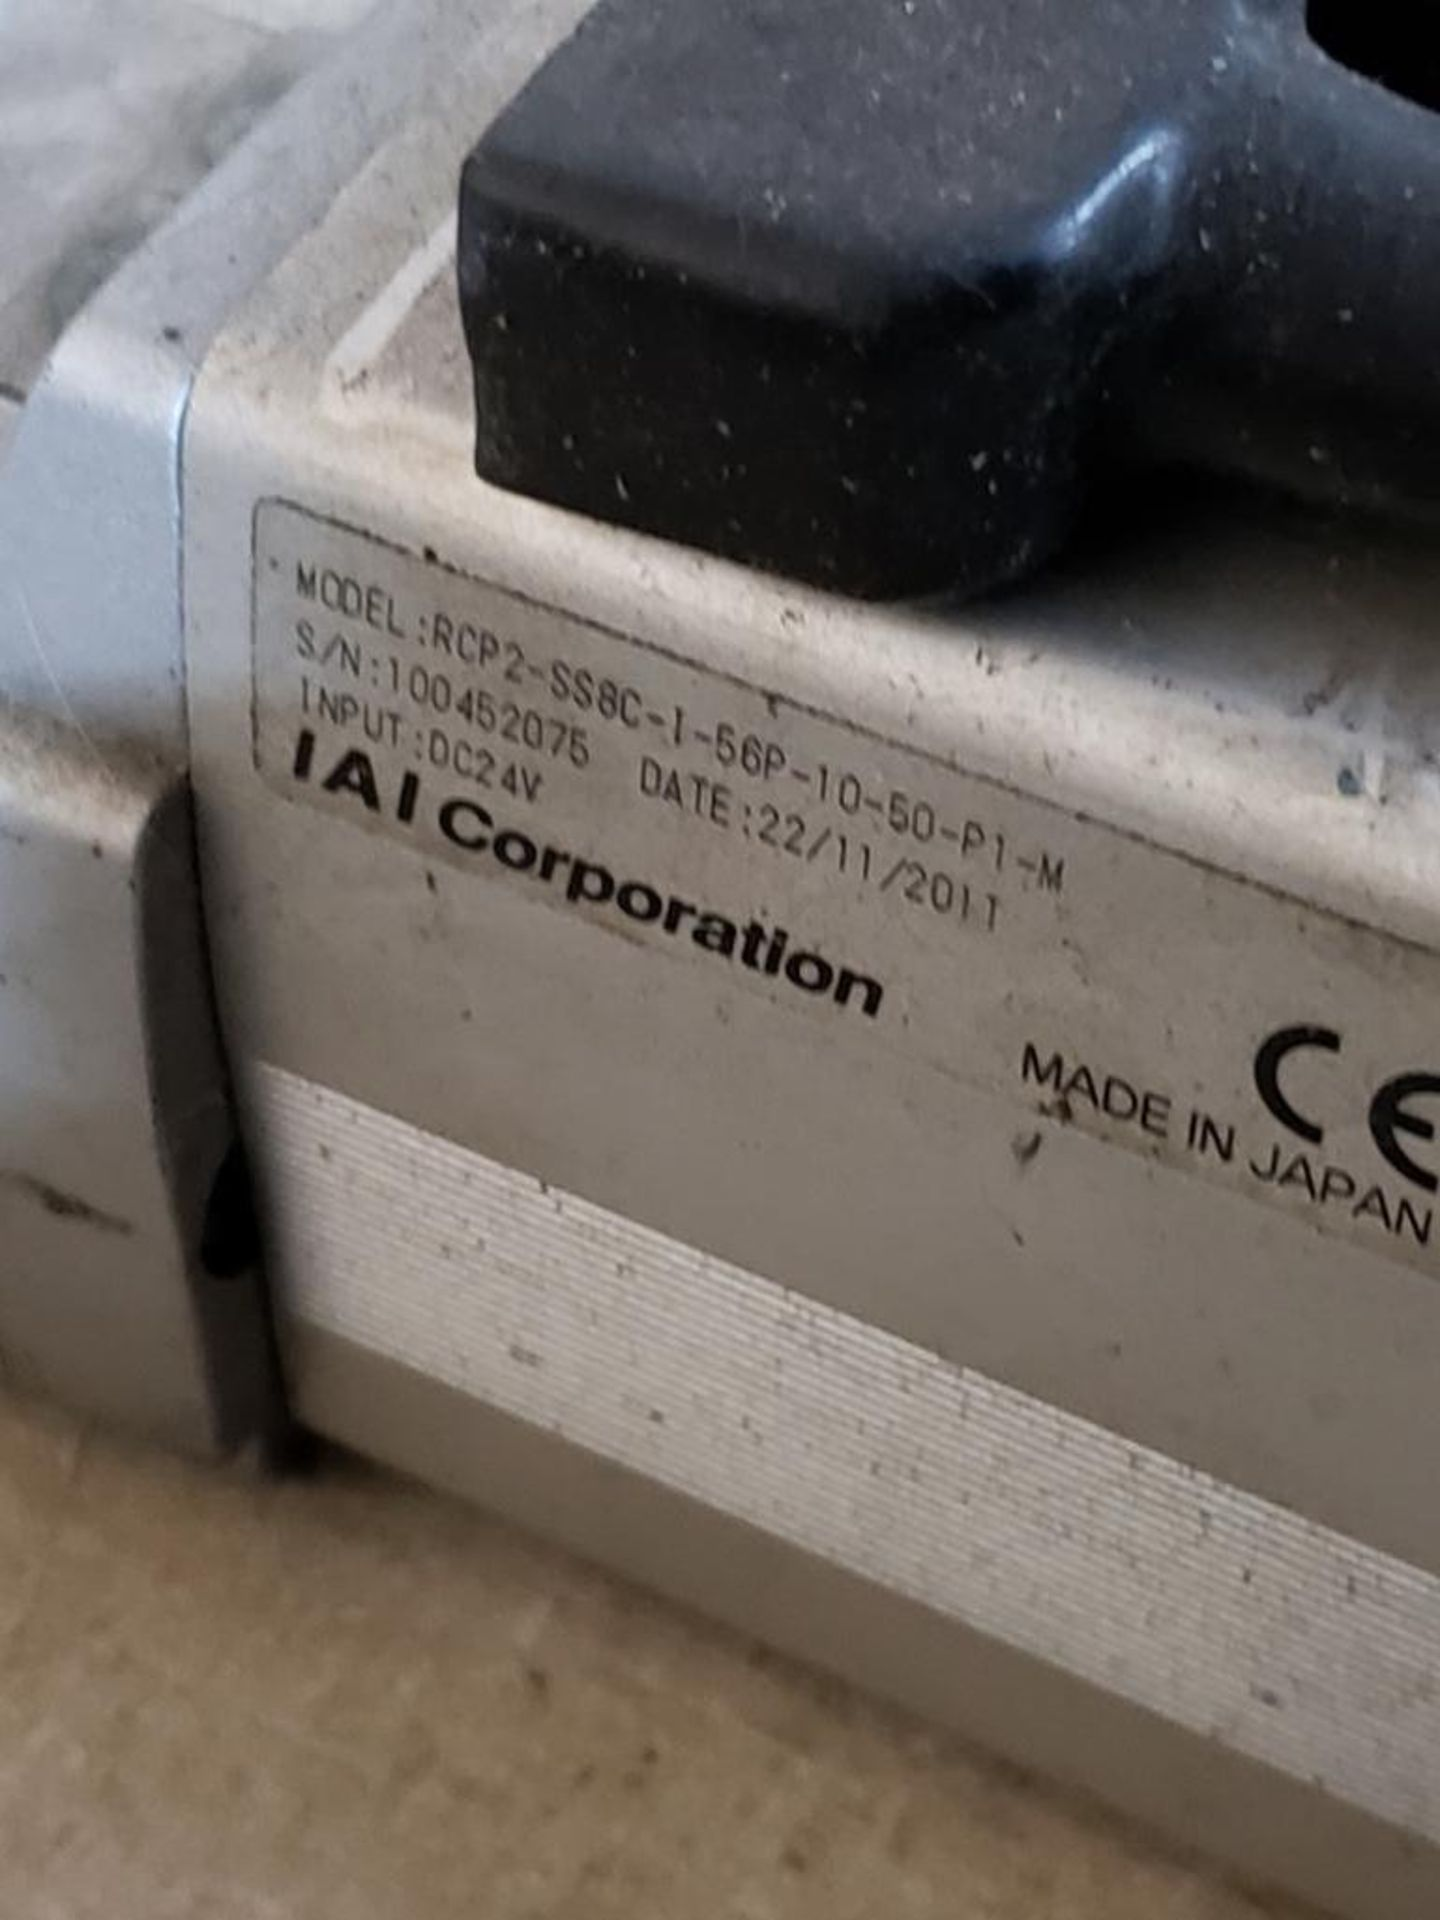 Lot 177 - Qty 2 - IAI linear actuator model RCP2-SS8C-1-56P-10-50-P1-M.